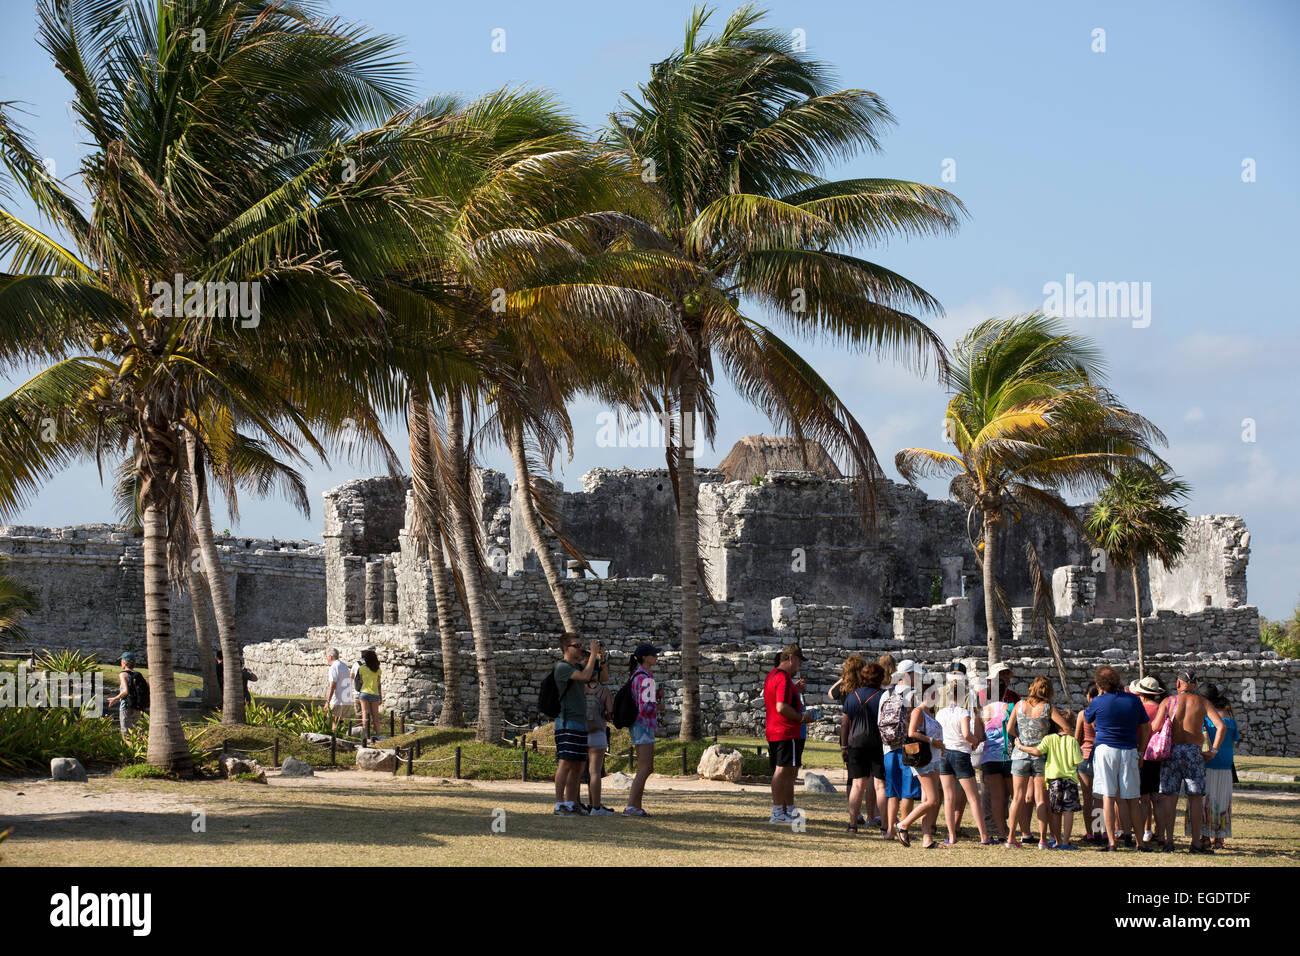 Tulum, Quintana Roo, Mexico - Stock Image